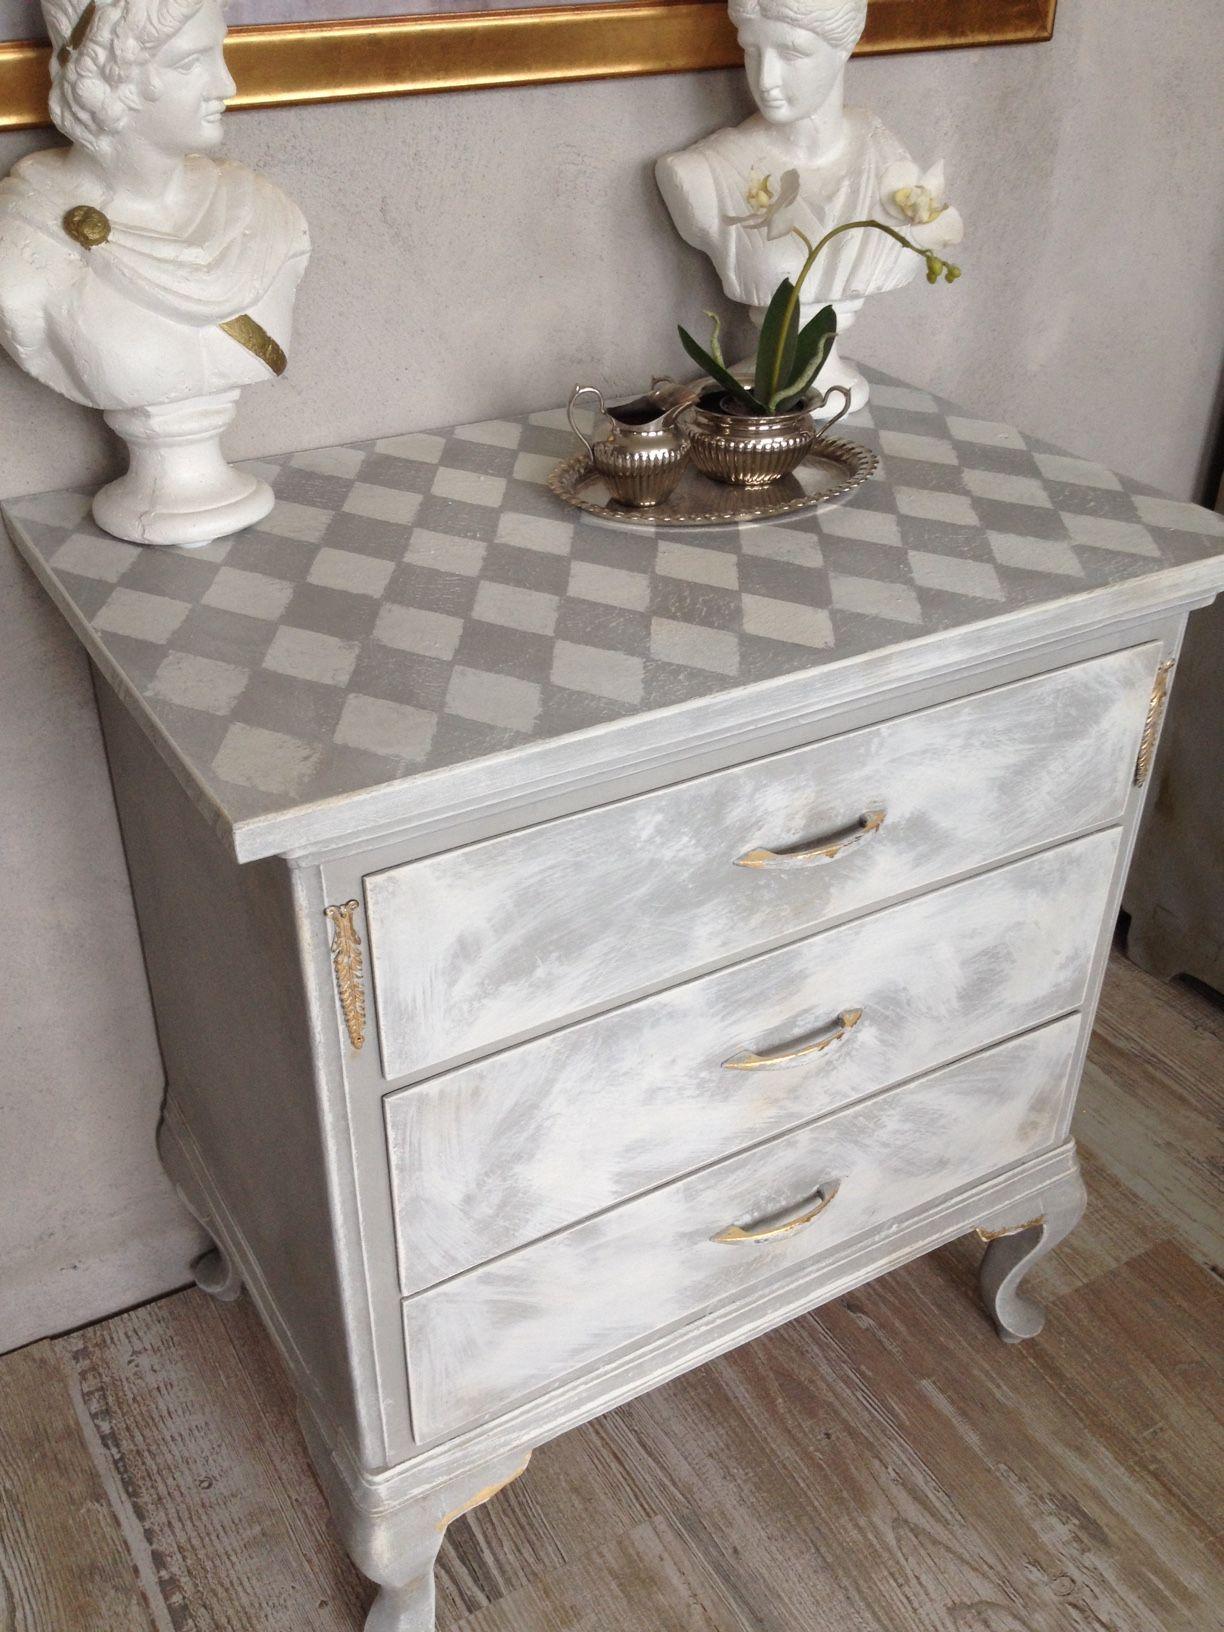 kommode möbel shabby chic grau weiß raute vintage antik fassmalerei